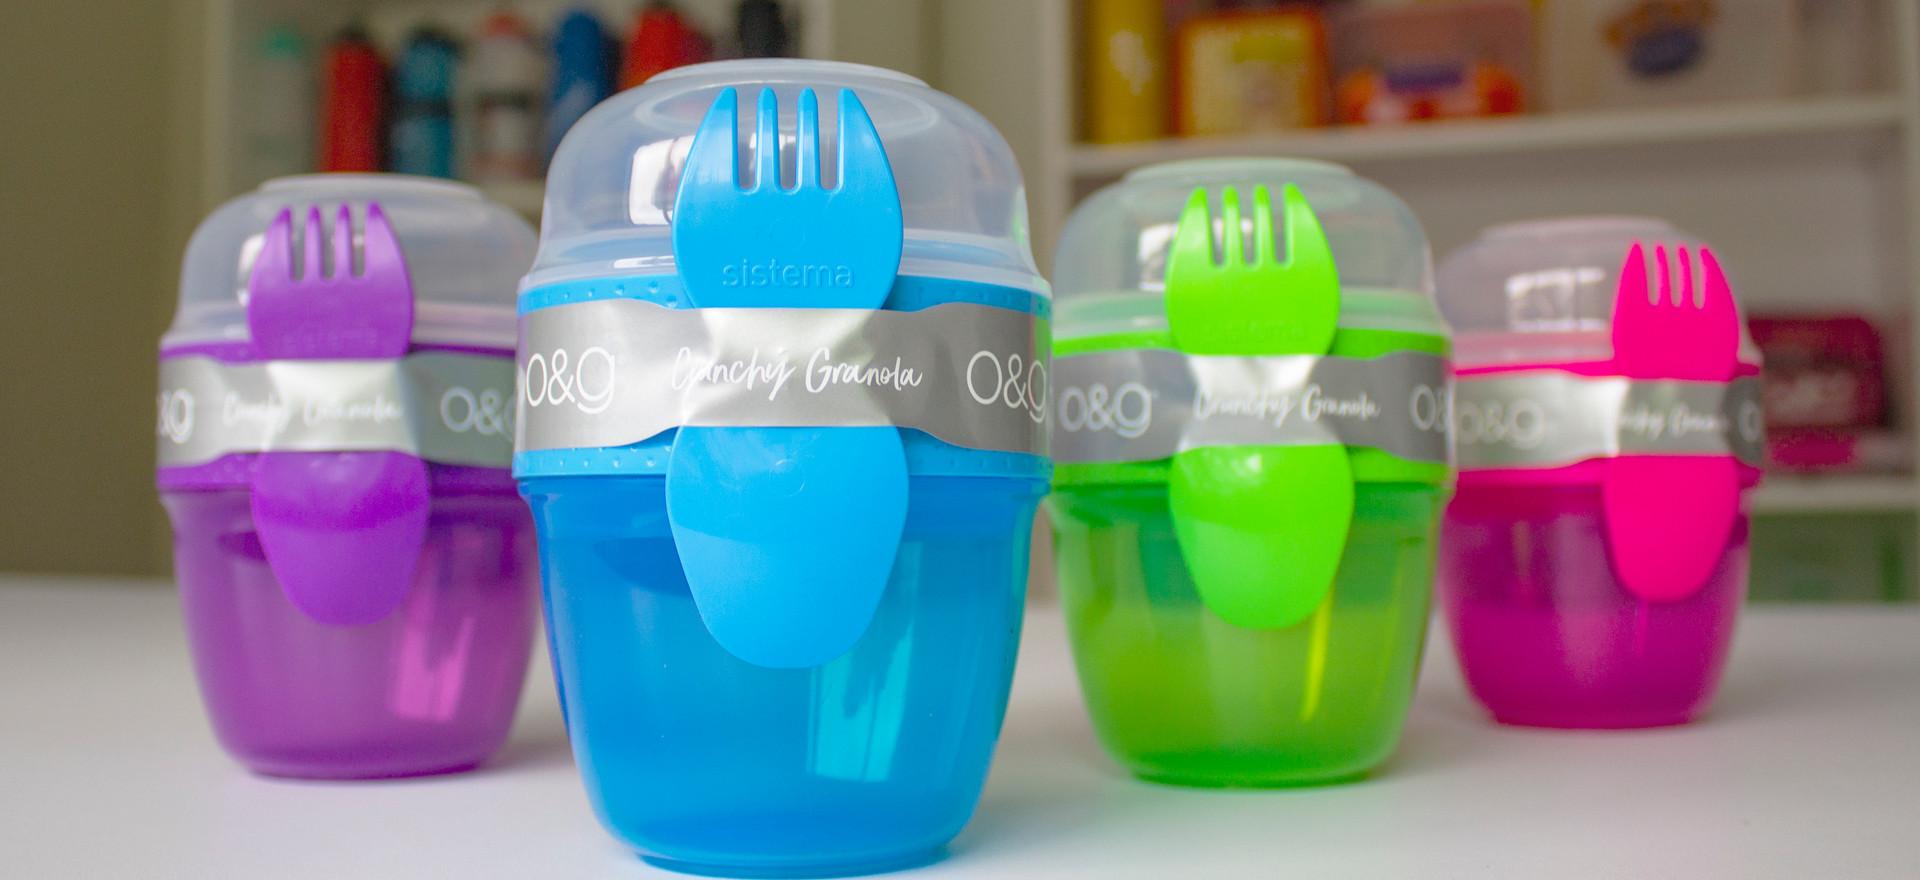 Nestle Snack Capsules.jpg